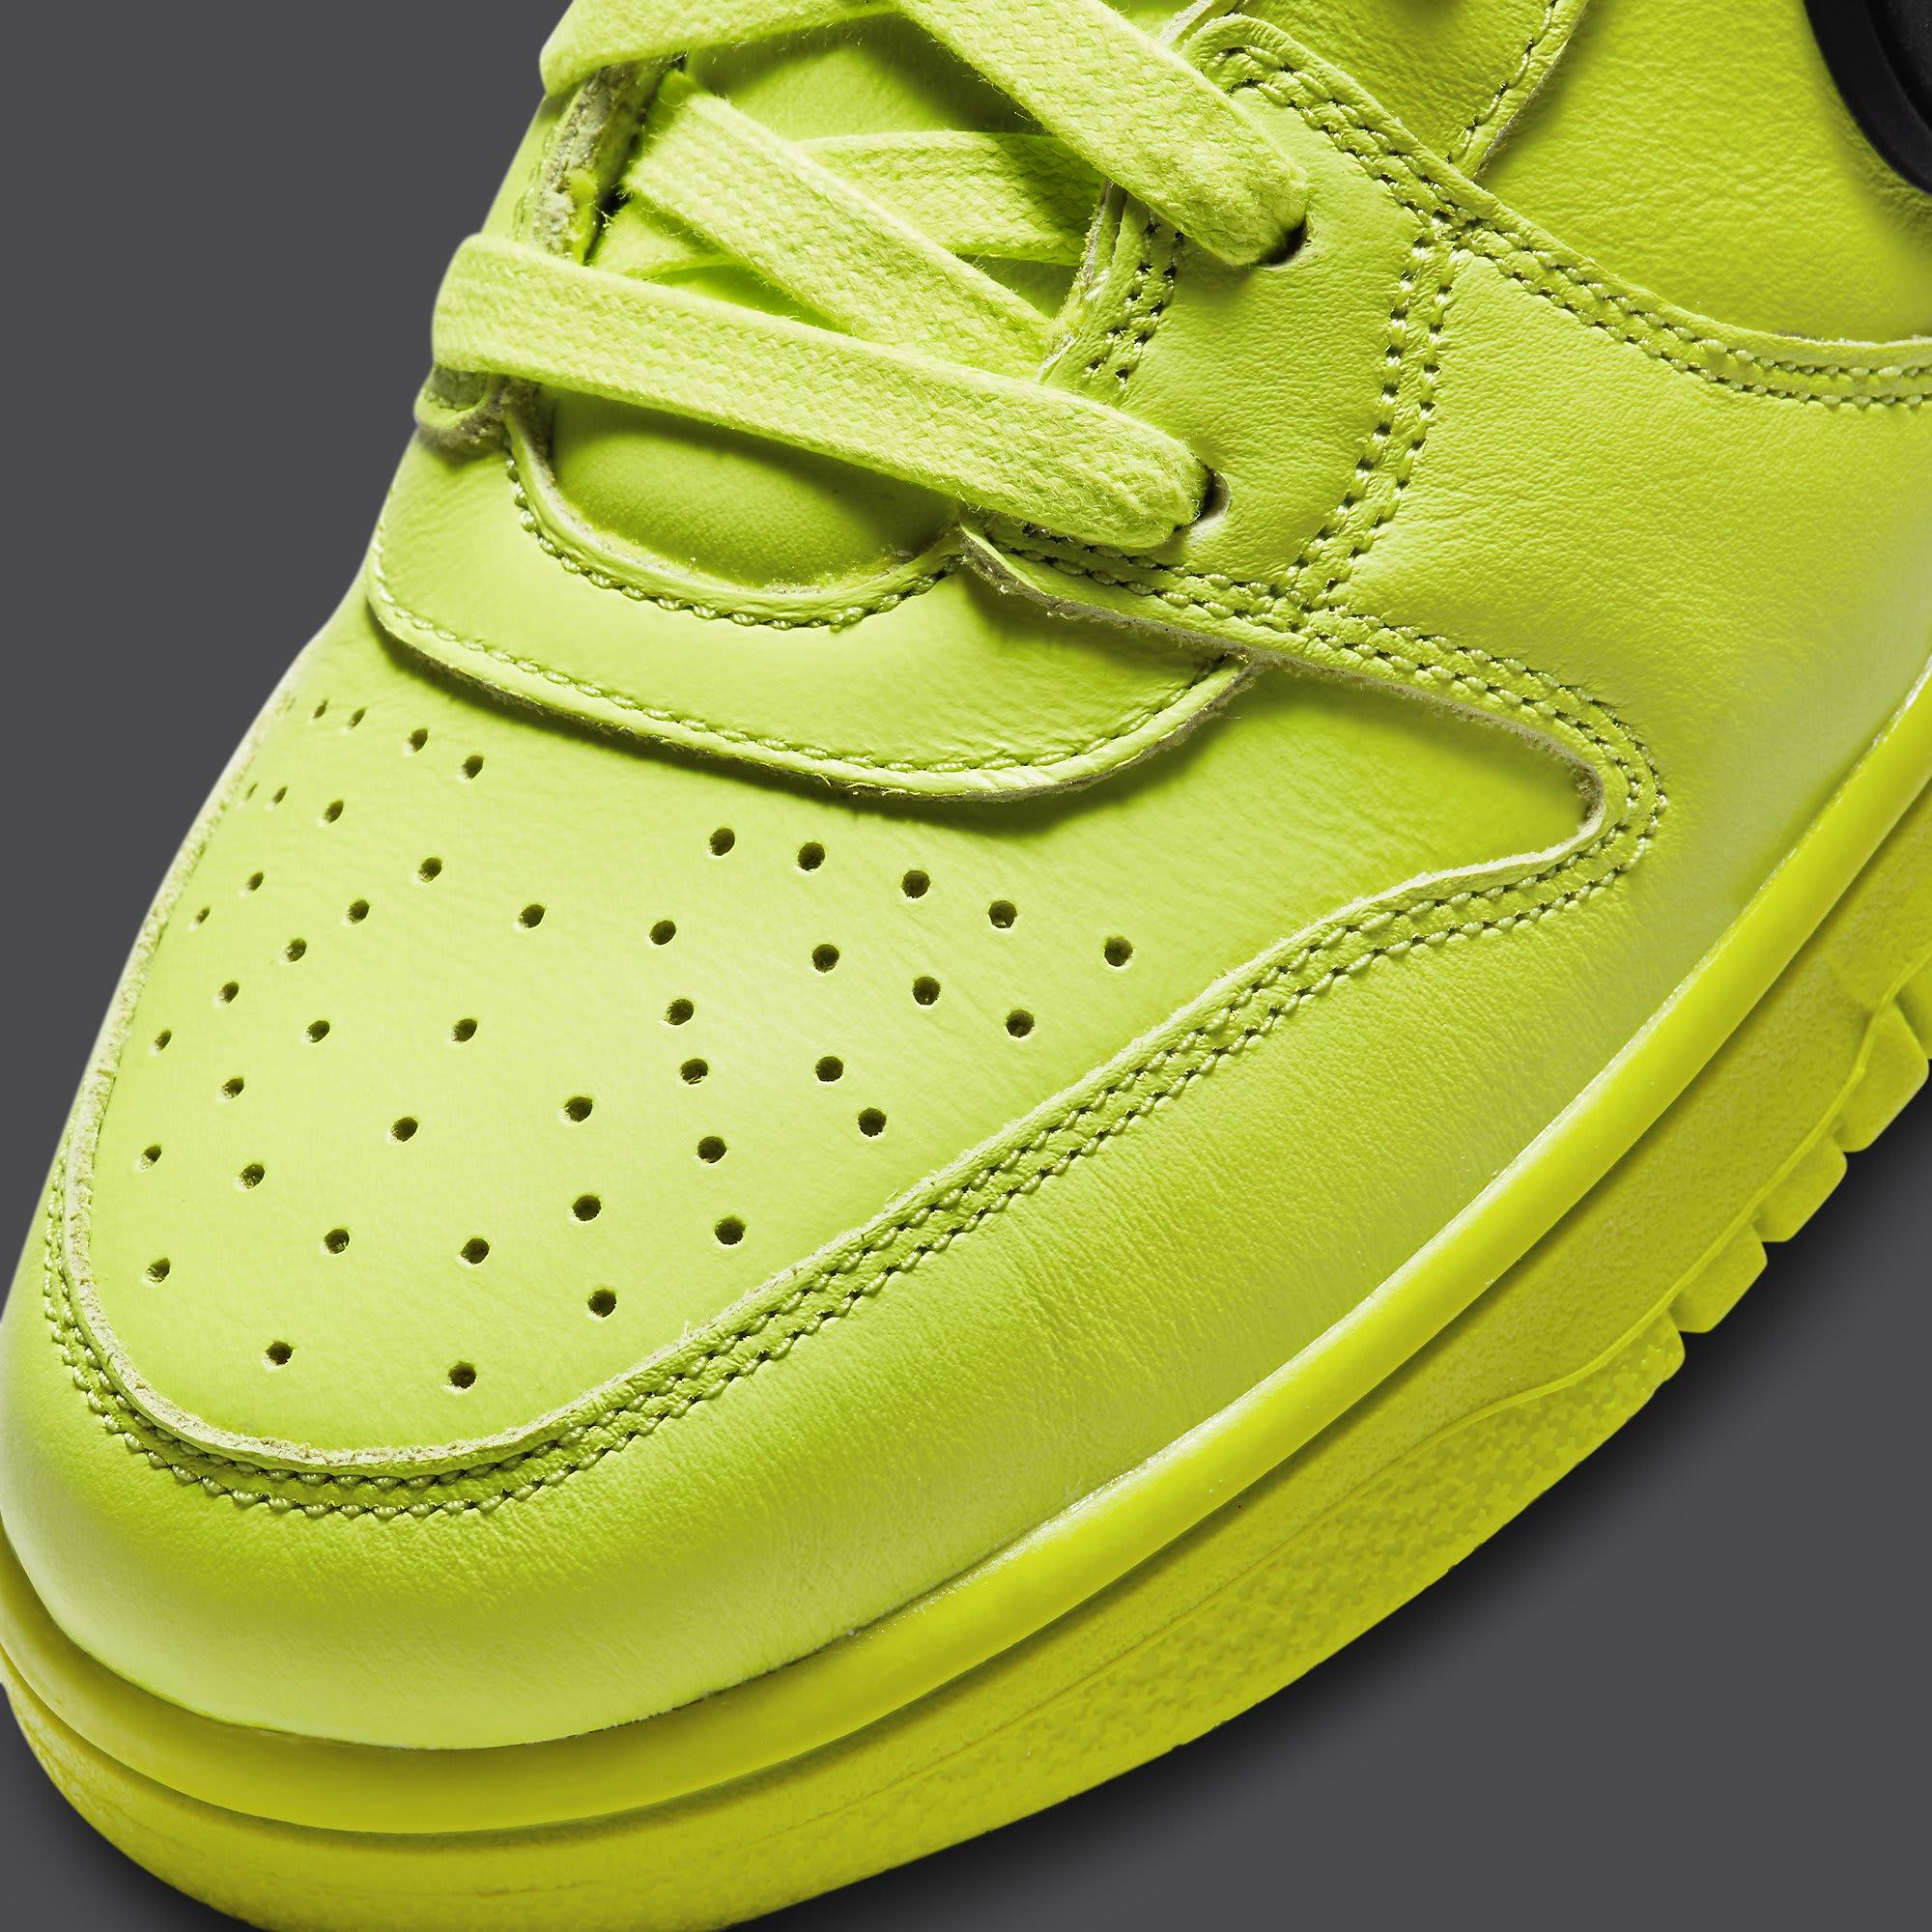 Ambush x Nike Dunk High Atomic Green Release Date CU7544-300 Toe Detail